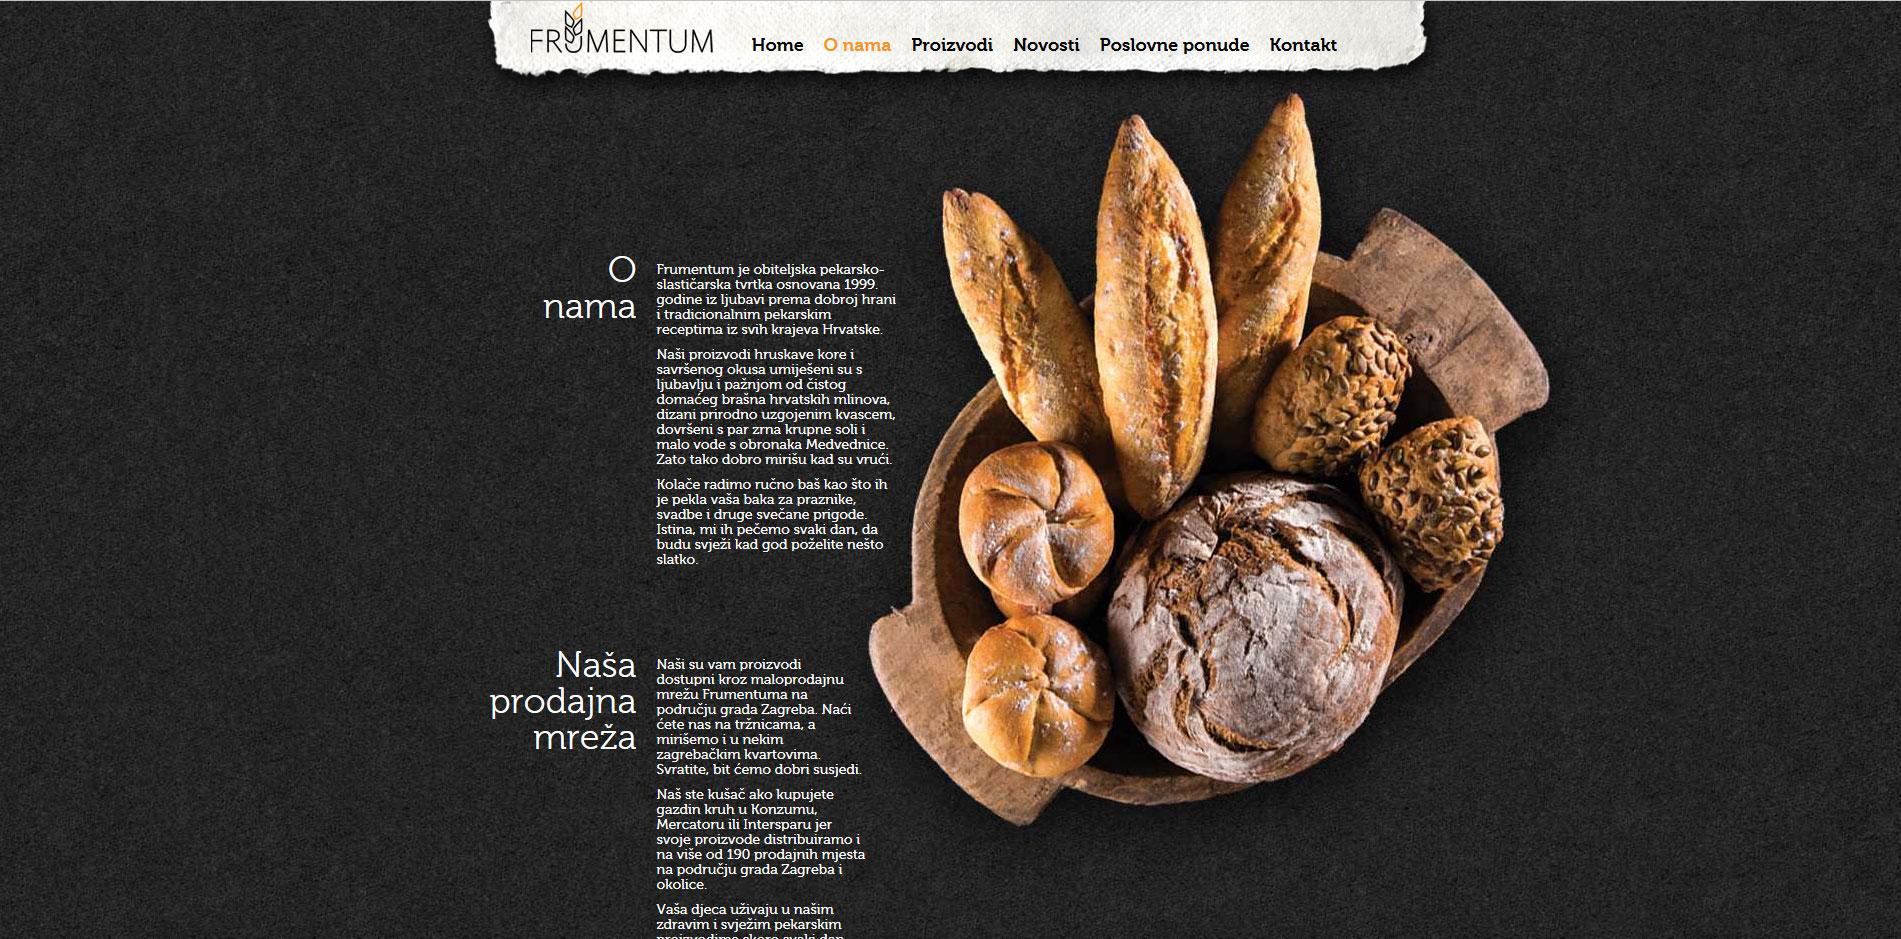 masavukmanovic.com - frumentum bakeries - branding 05